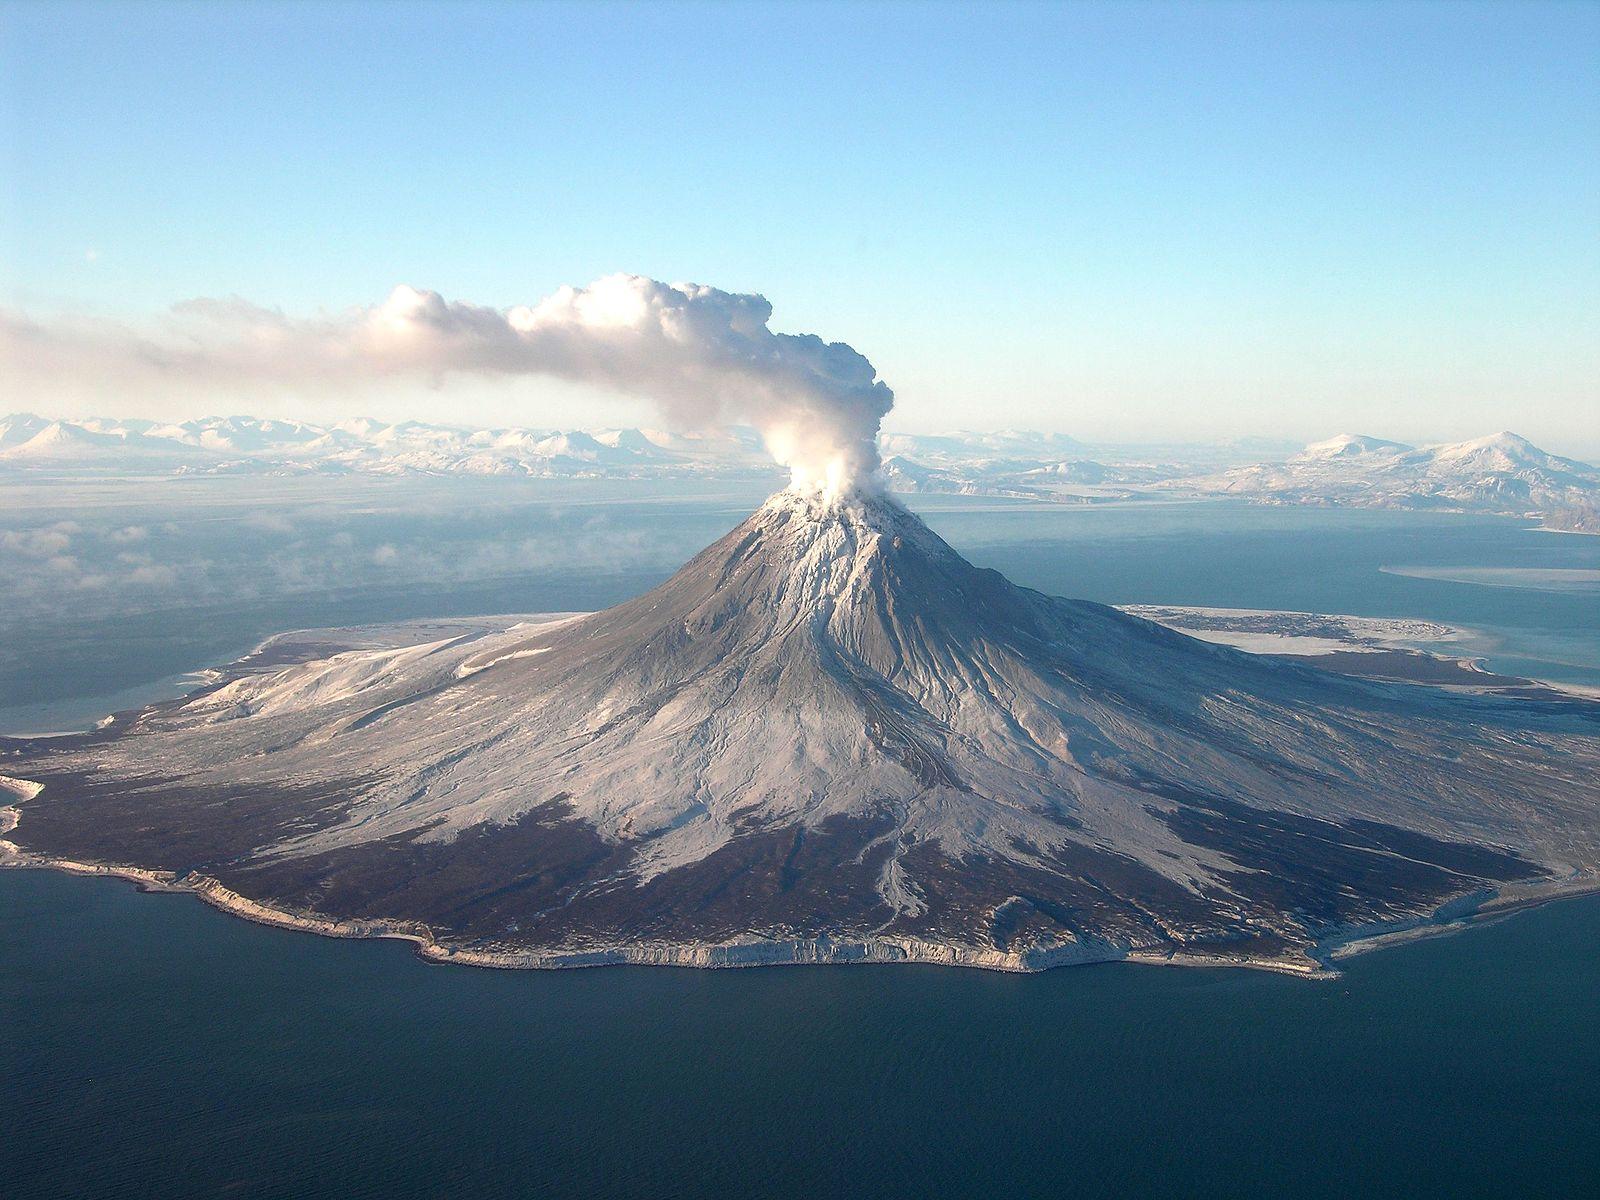 Augustine_volcano_Jan_24_2006_-_Cyrus_Read